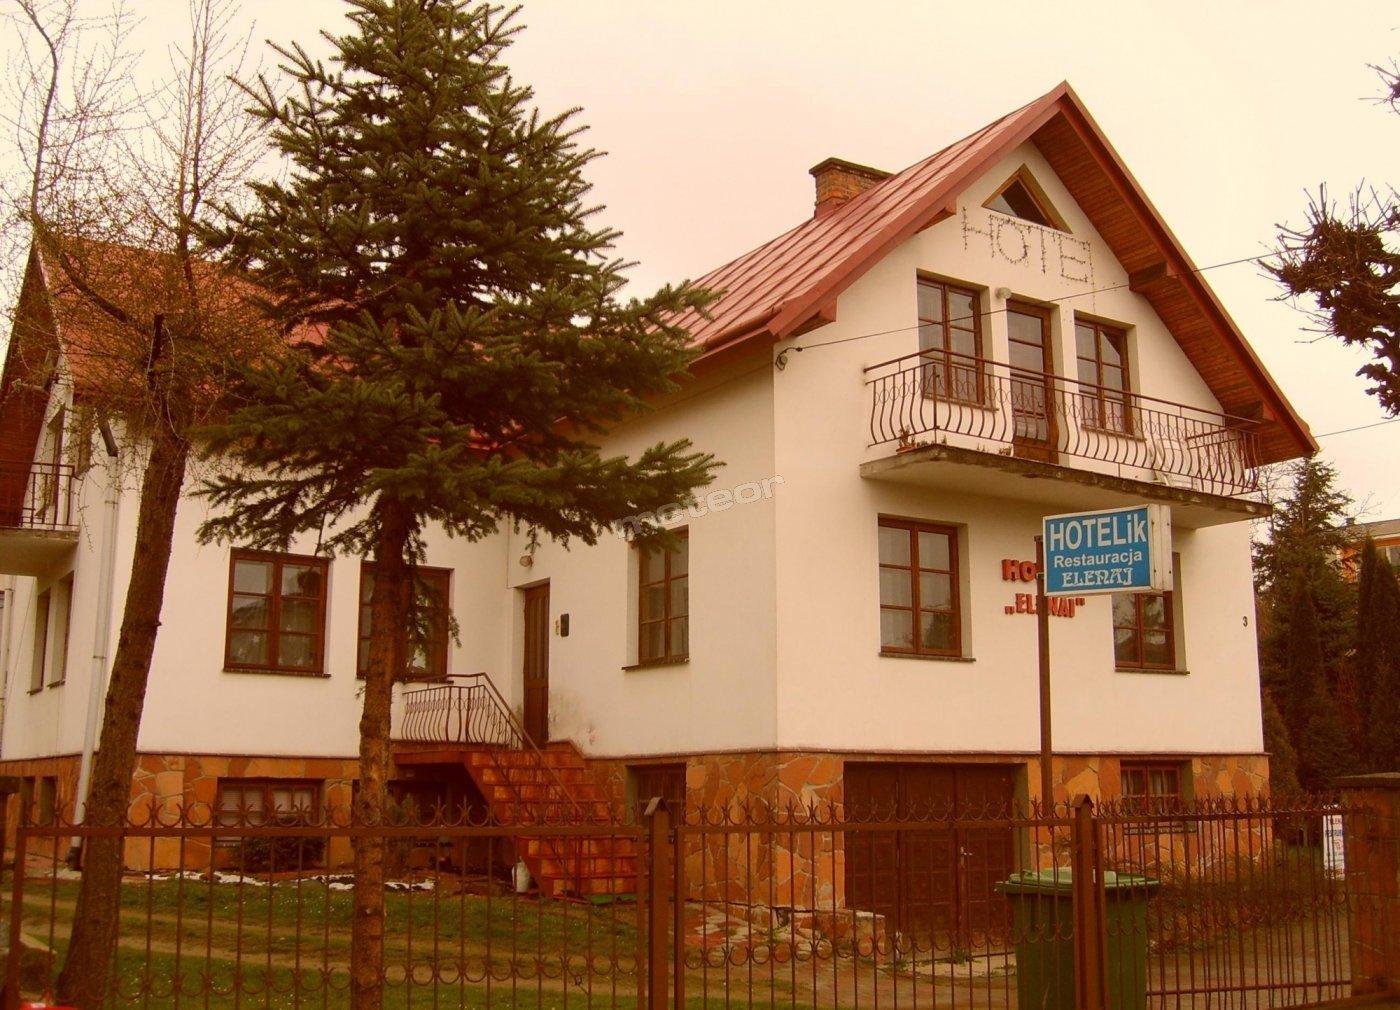 Zajazd Elenai